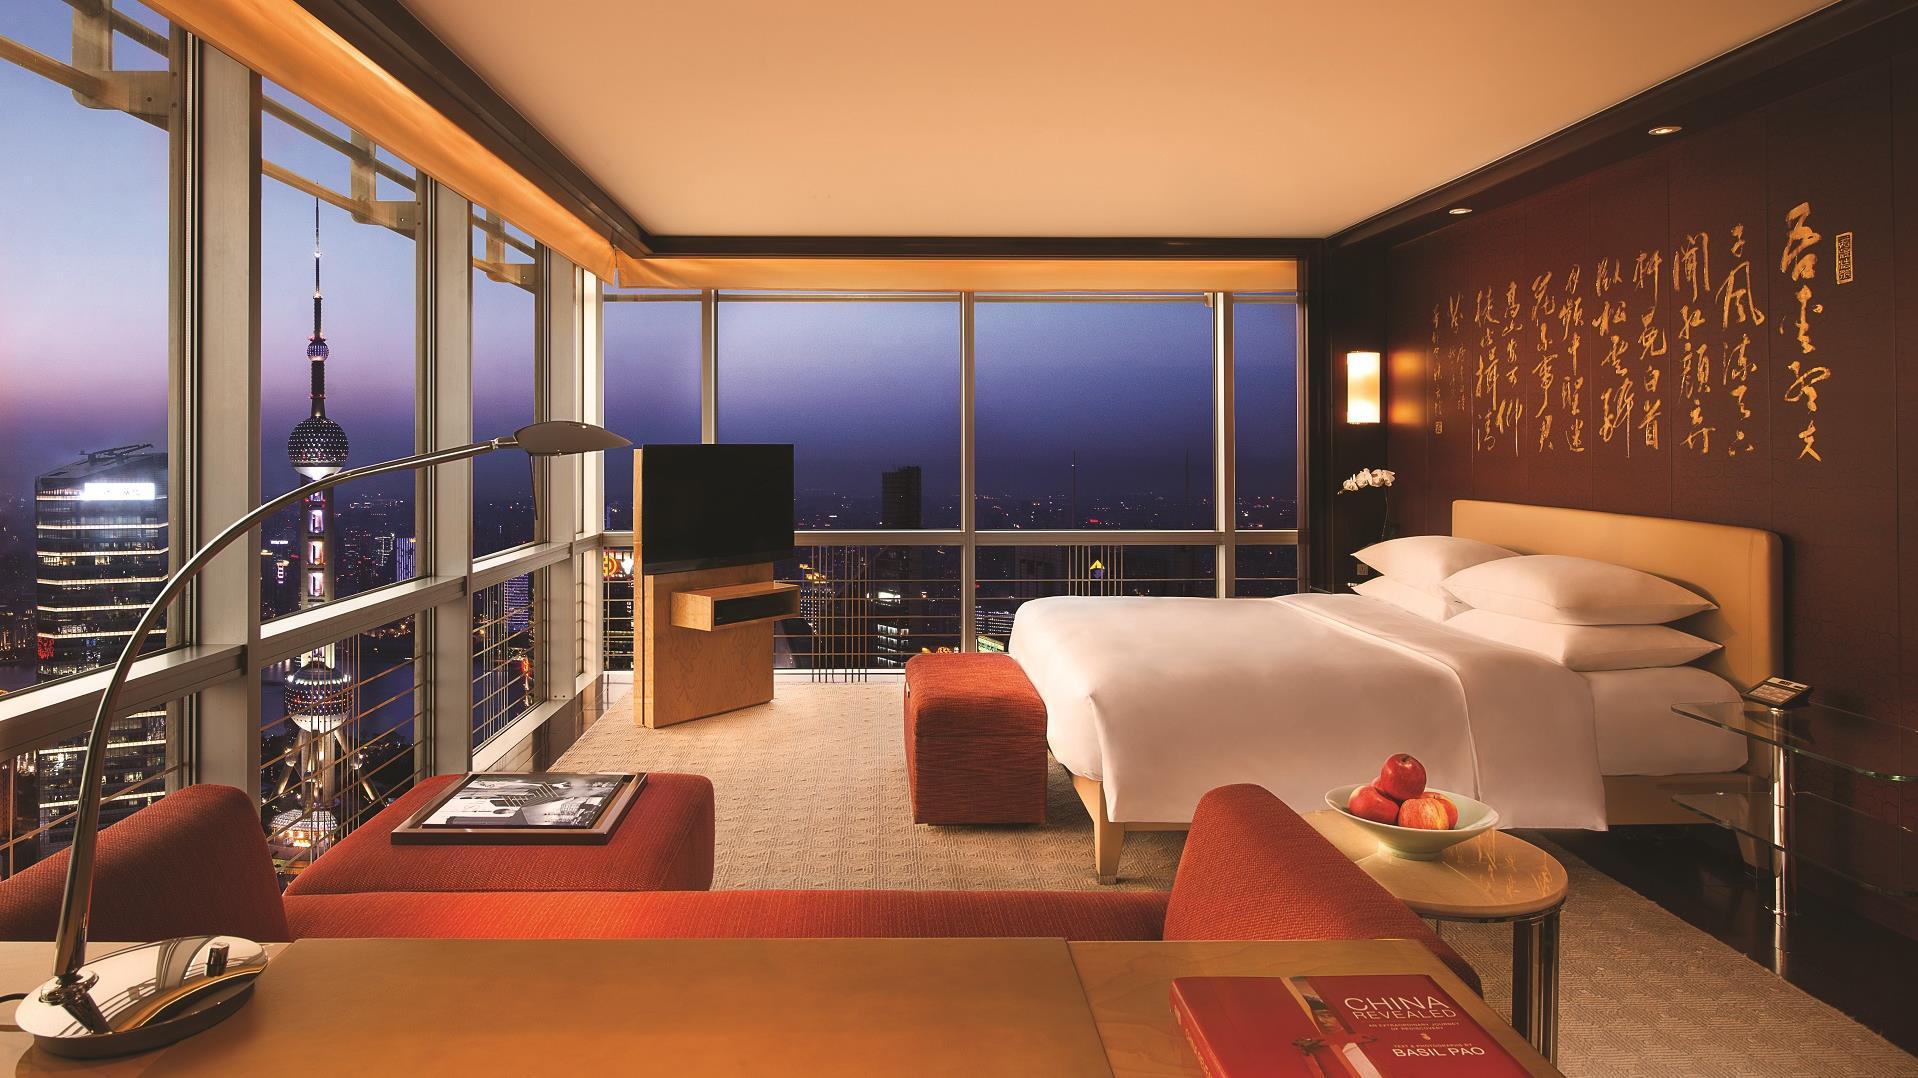 japanese restaurant decor.htm meetings and events at grand hyatt shanghai  shanghai  cn  grand hyatt shanghai